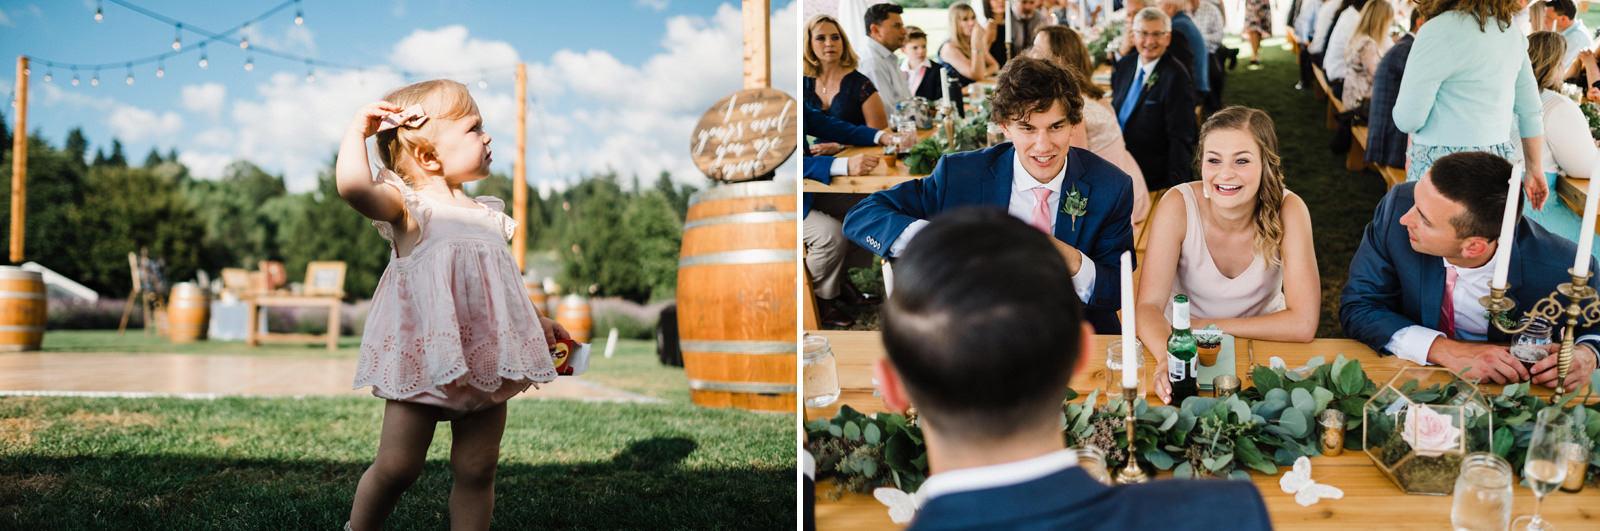 060-woodinville-lavendar-farm-wedding-with-golden-glowy-photos.jpg